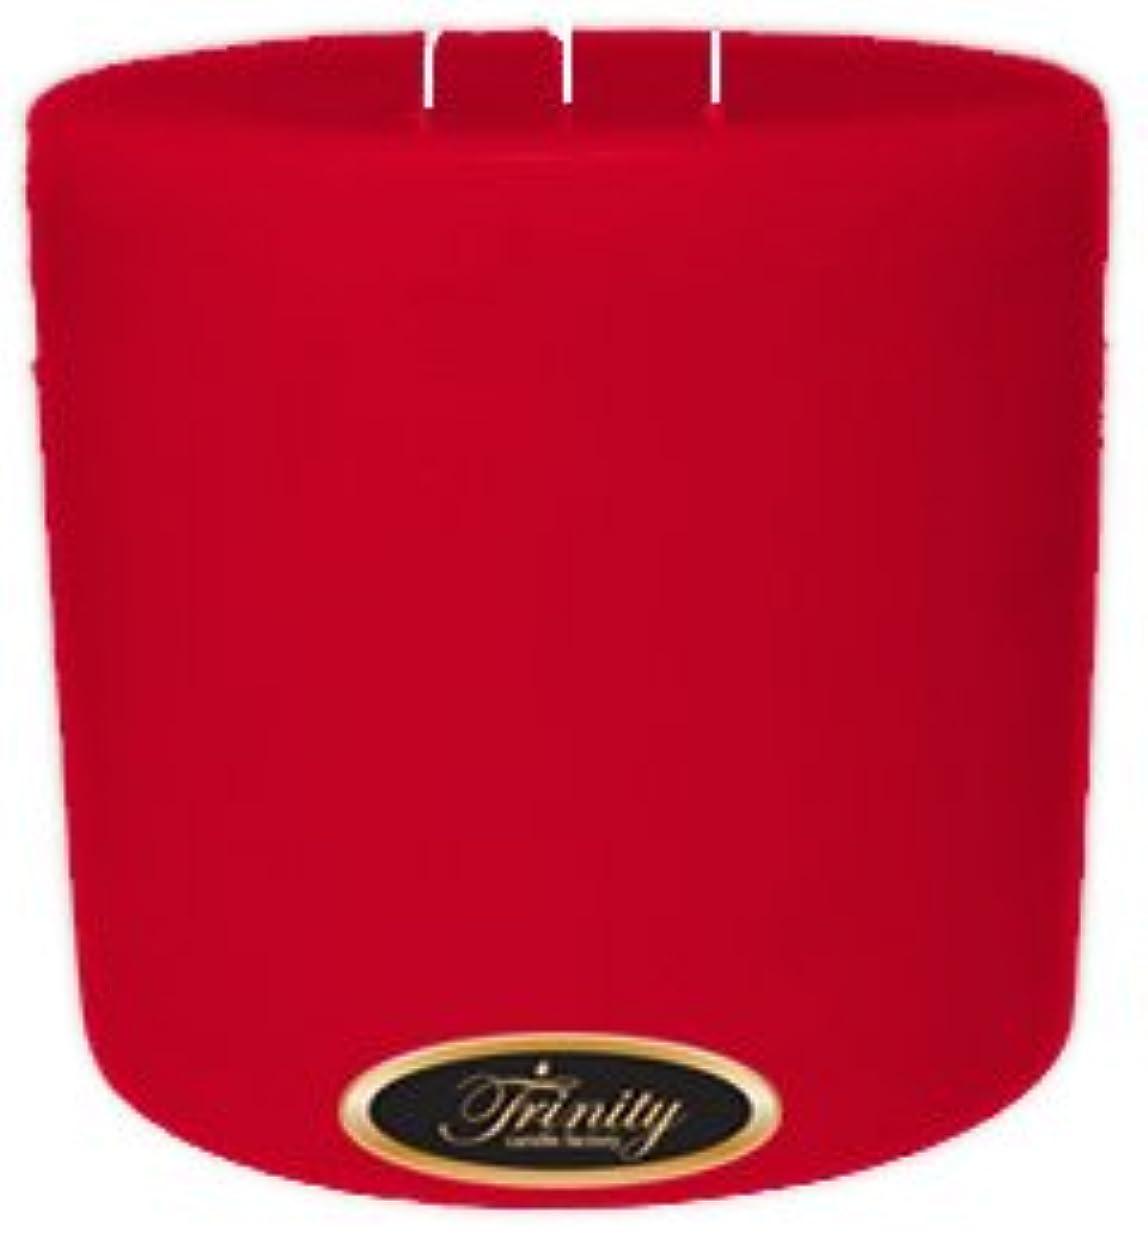 代表団作詞家過去Trinity Candle工場 – Holly Berry – Pillar Candle – 6 x 6